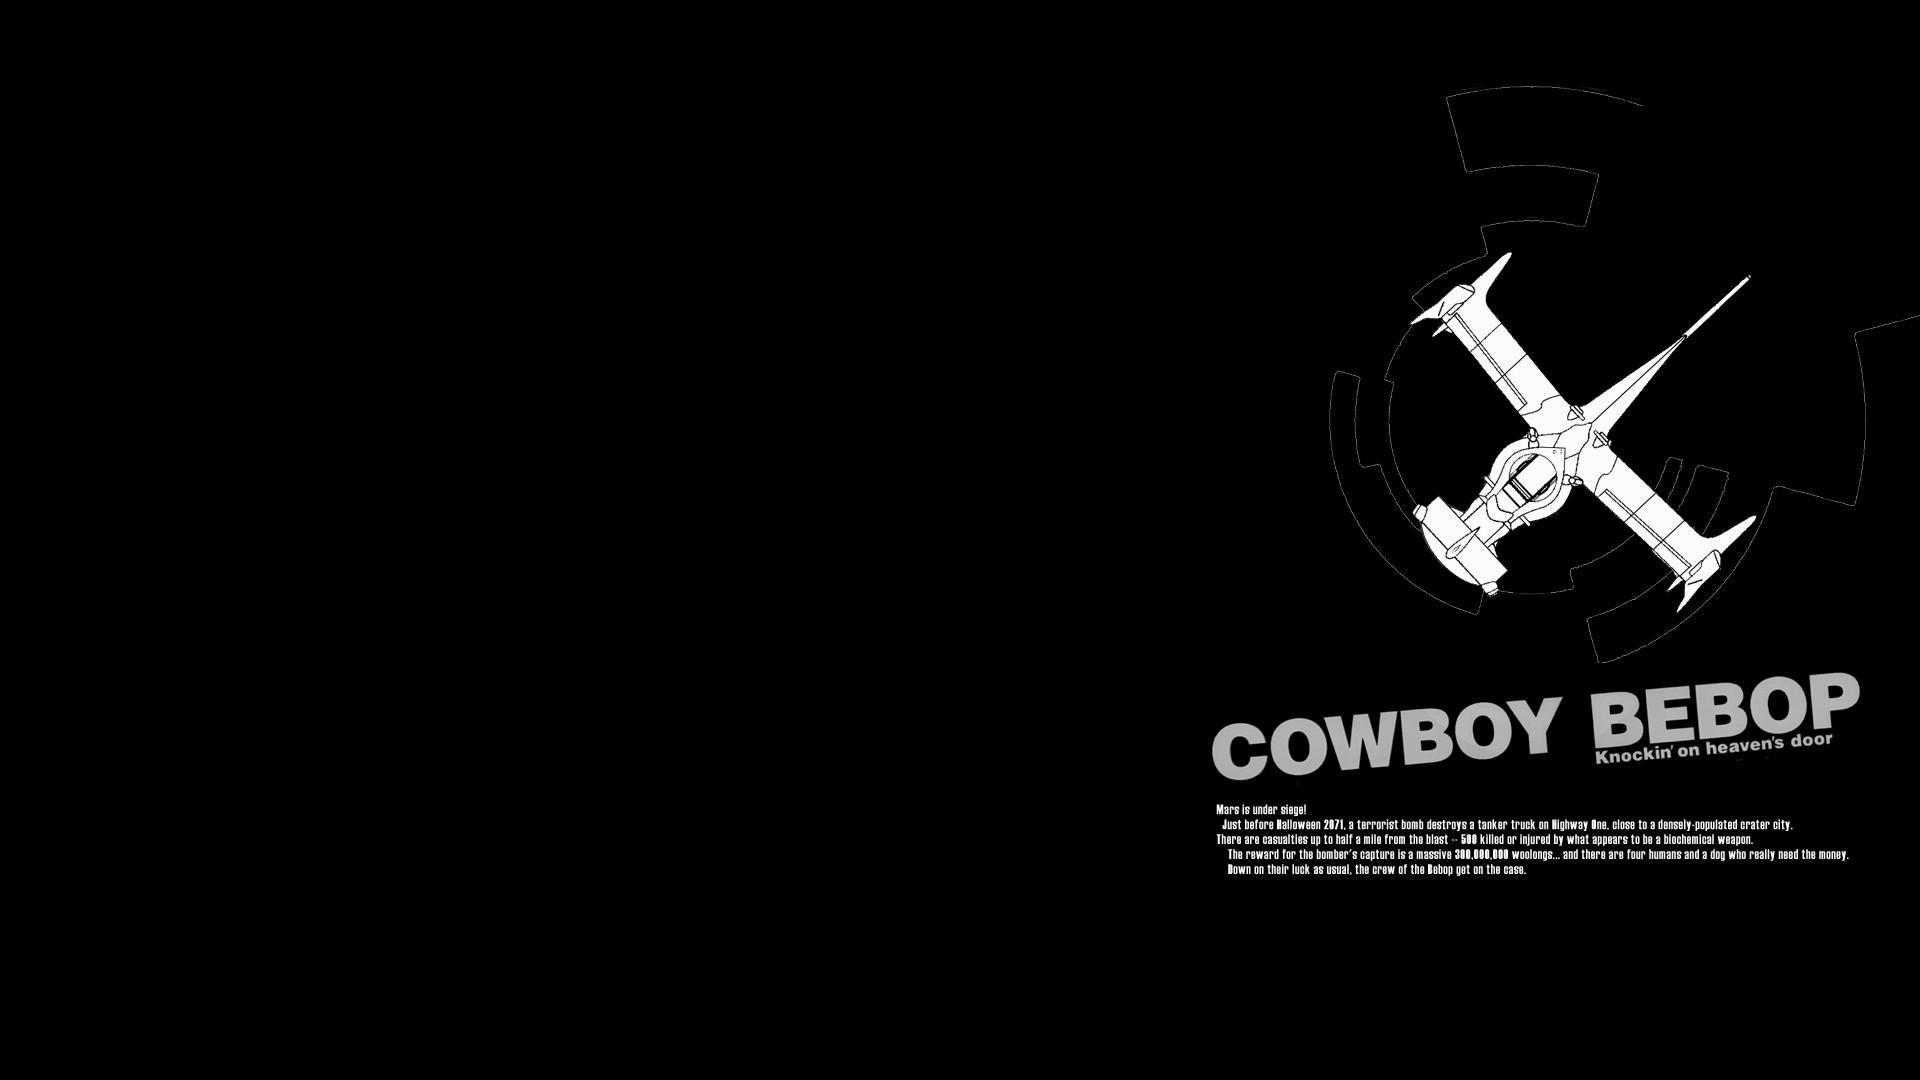 Pictures-Cowboy-Bebop-Backgrounds